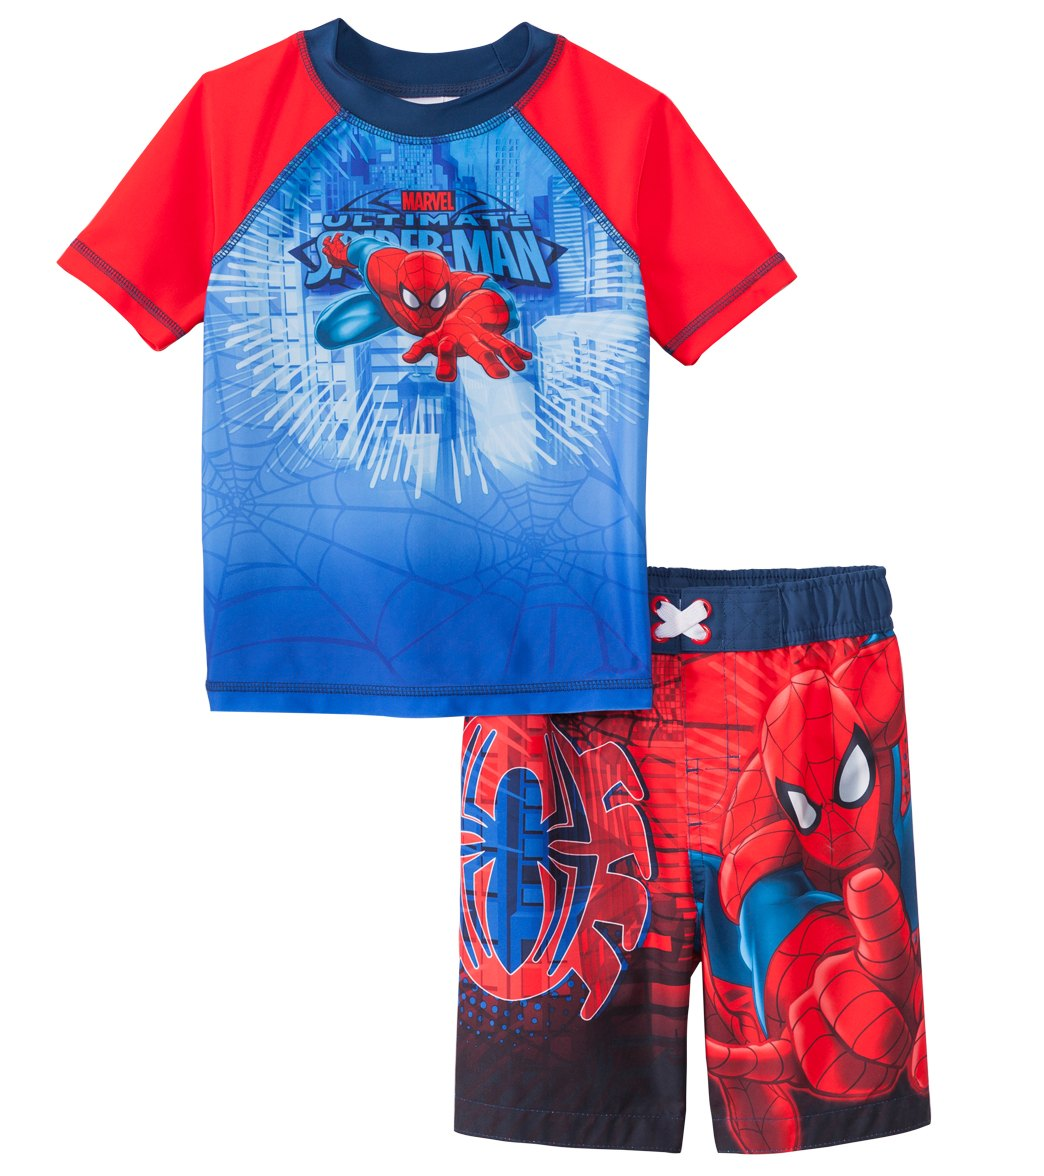 825c5df2e5d0a Swimwear Sets C-Life Avengers Super Hero Little Boys Swim Trunks and Rash  Guard Shirt Set